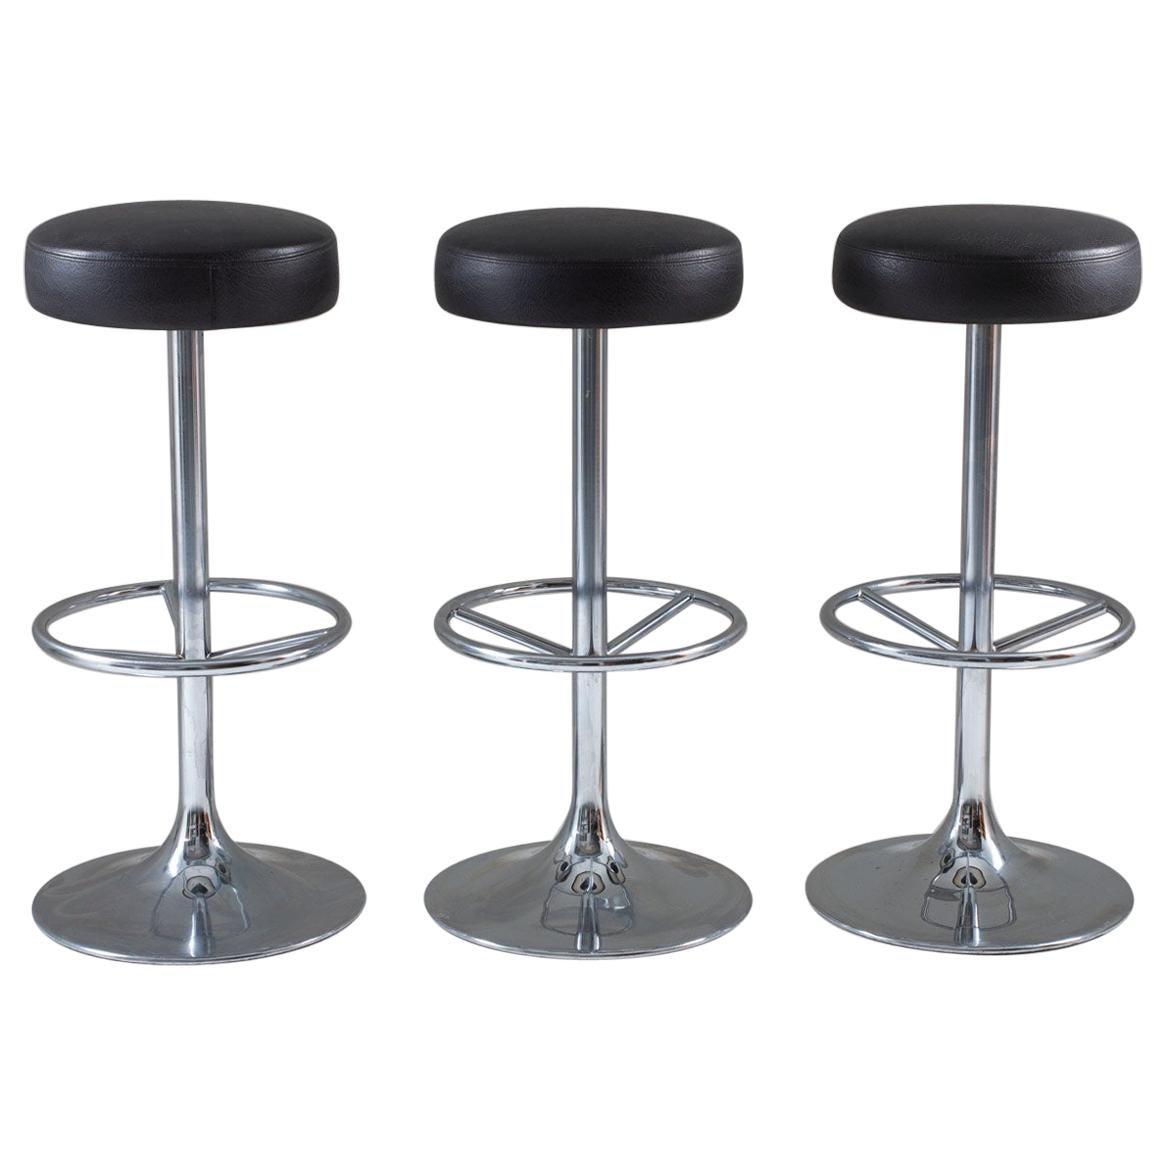 Set of Three Swedish Chrome Bar Stools by Johanson Design